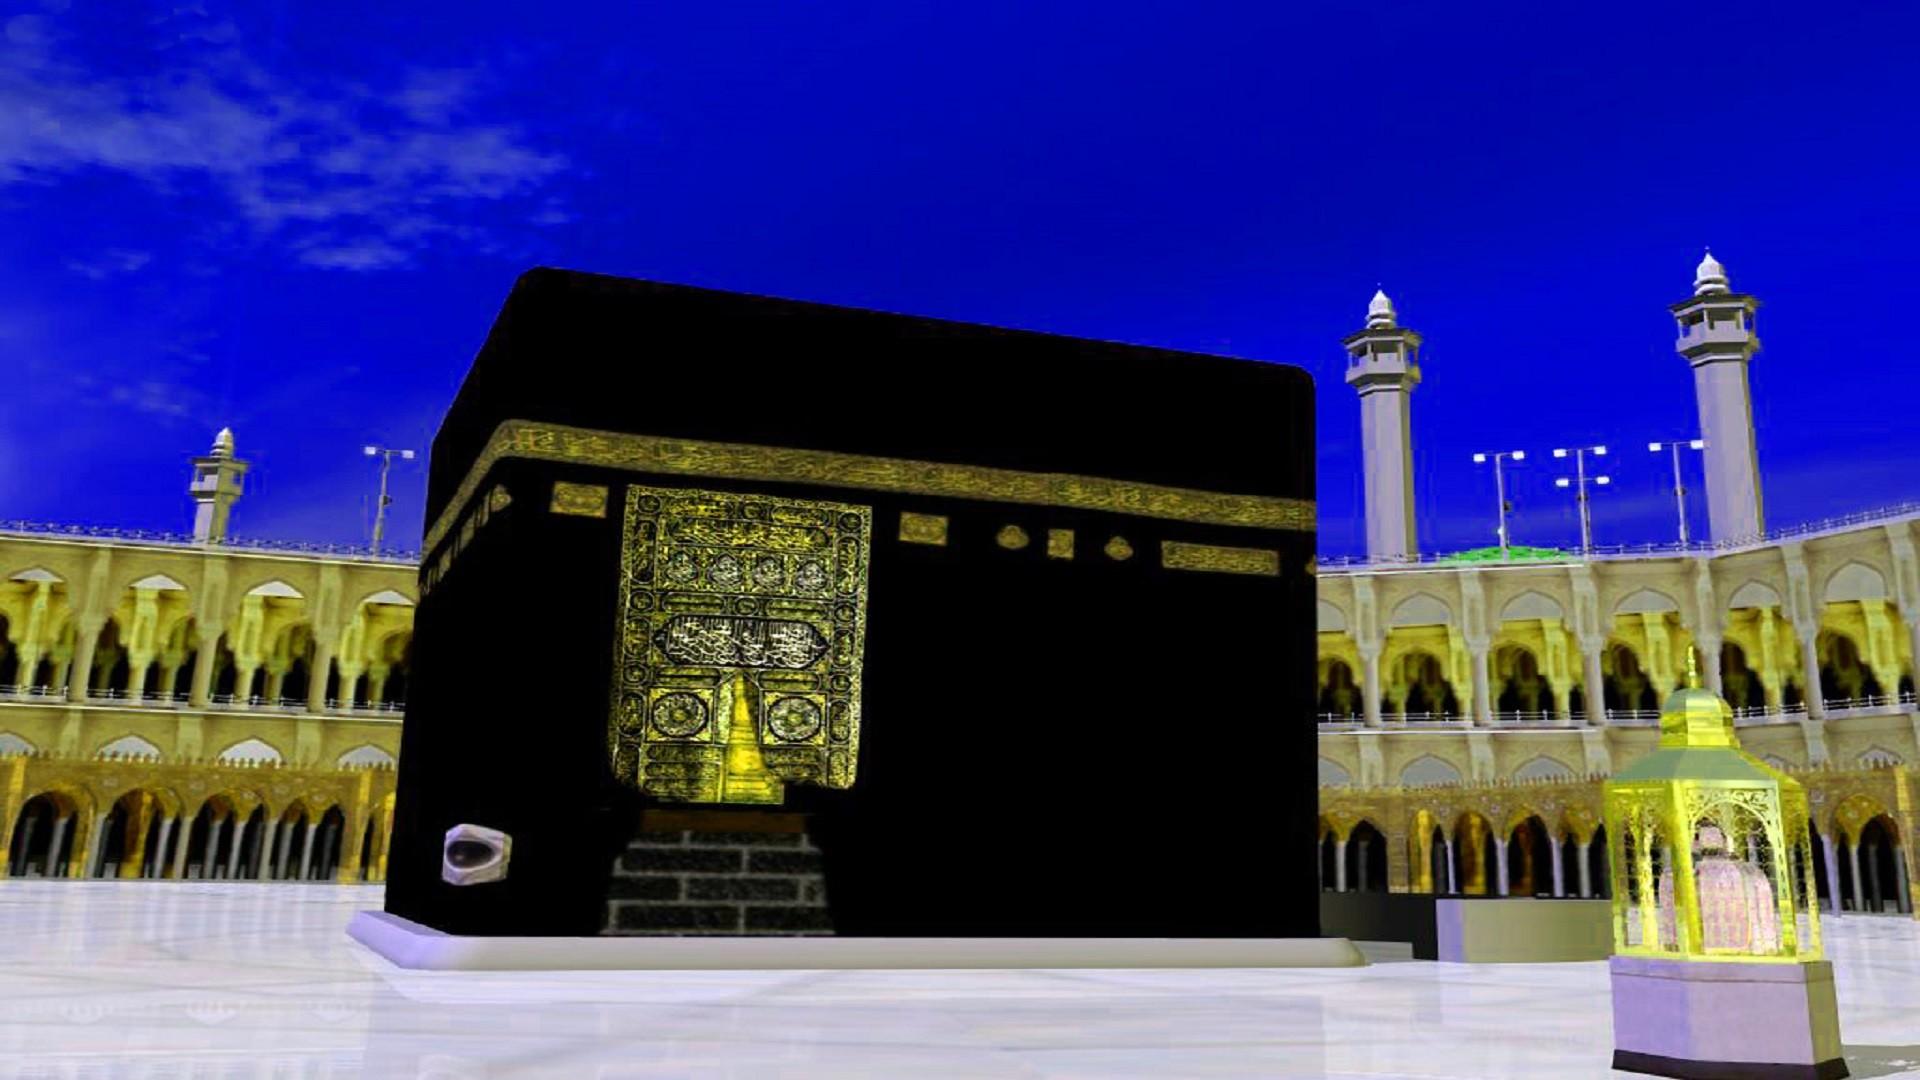 Mecca and madina photos Purpledip Muslim Religious Mecca Madina Showpiece